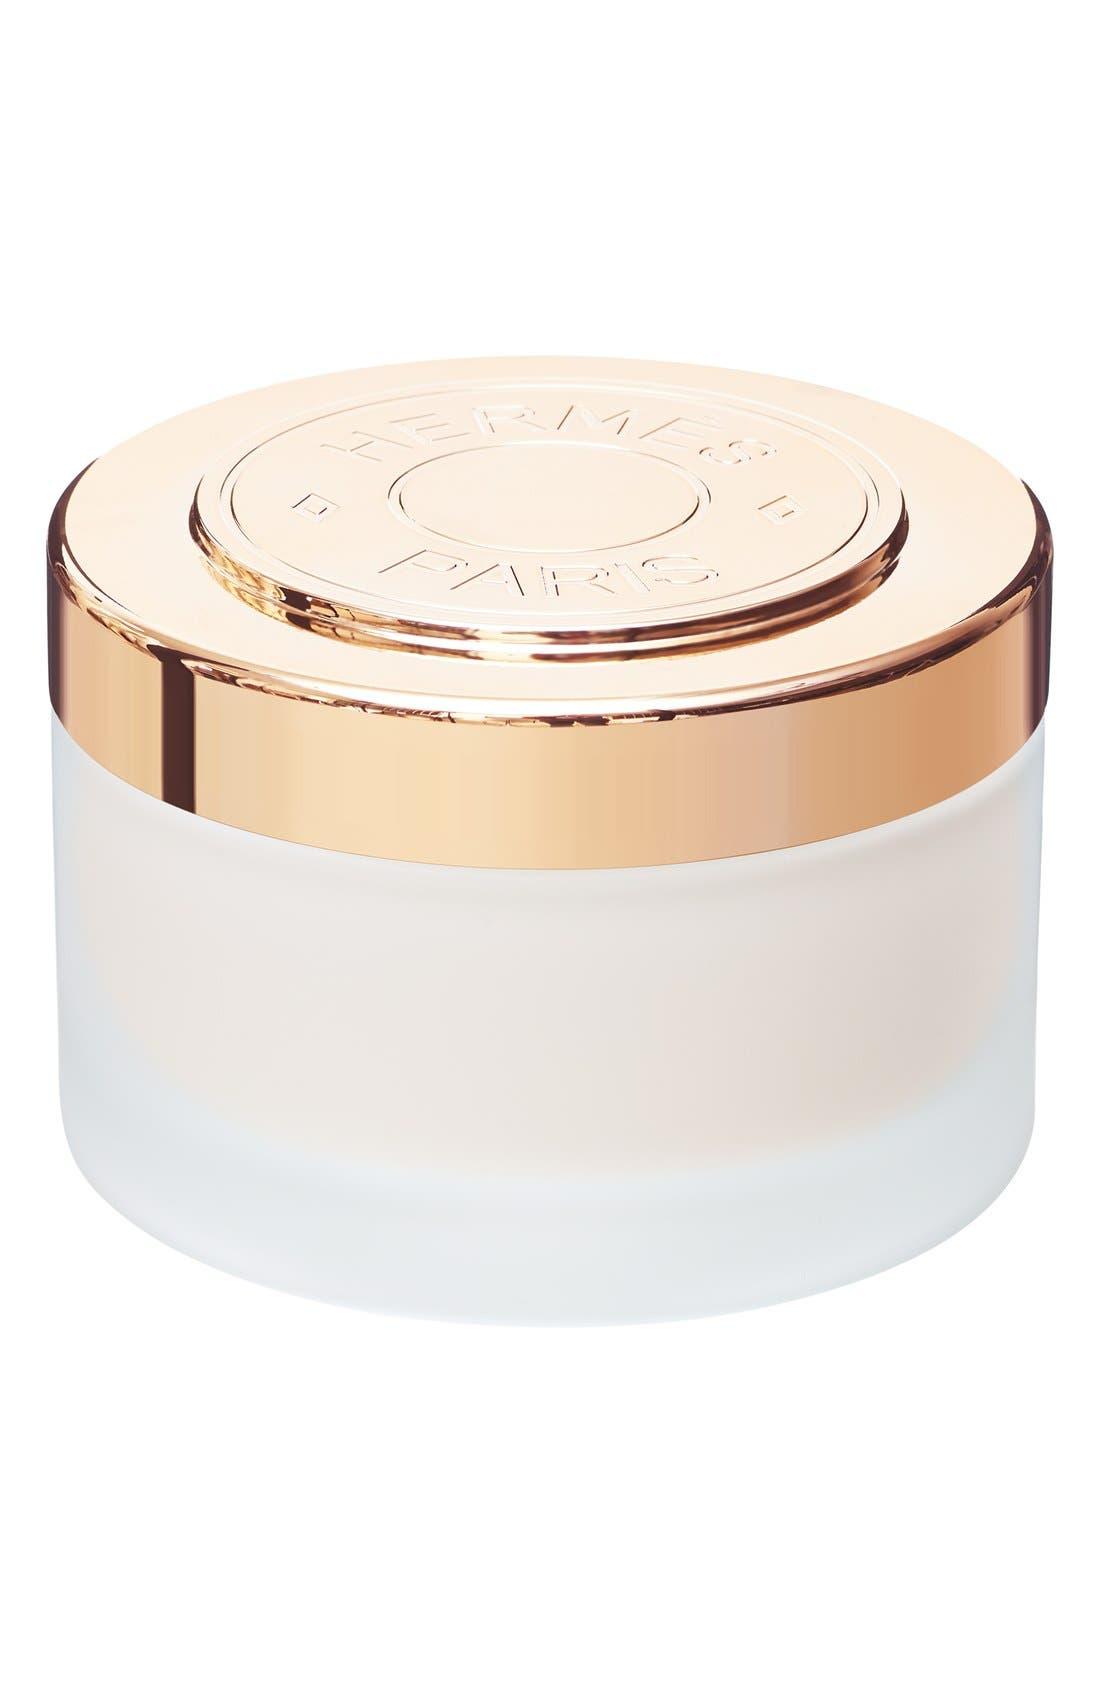 Jour d'Hermès - Moisturizing perfumed balm,                             Main thumbnail 1, color,                             000